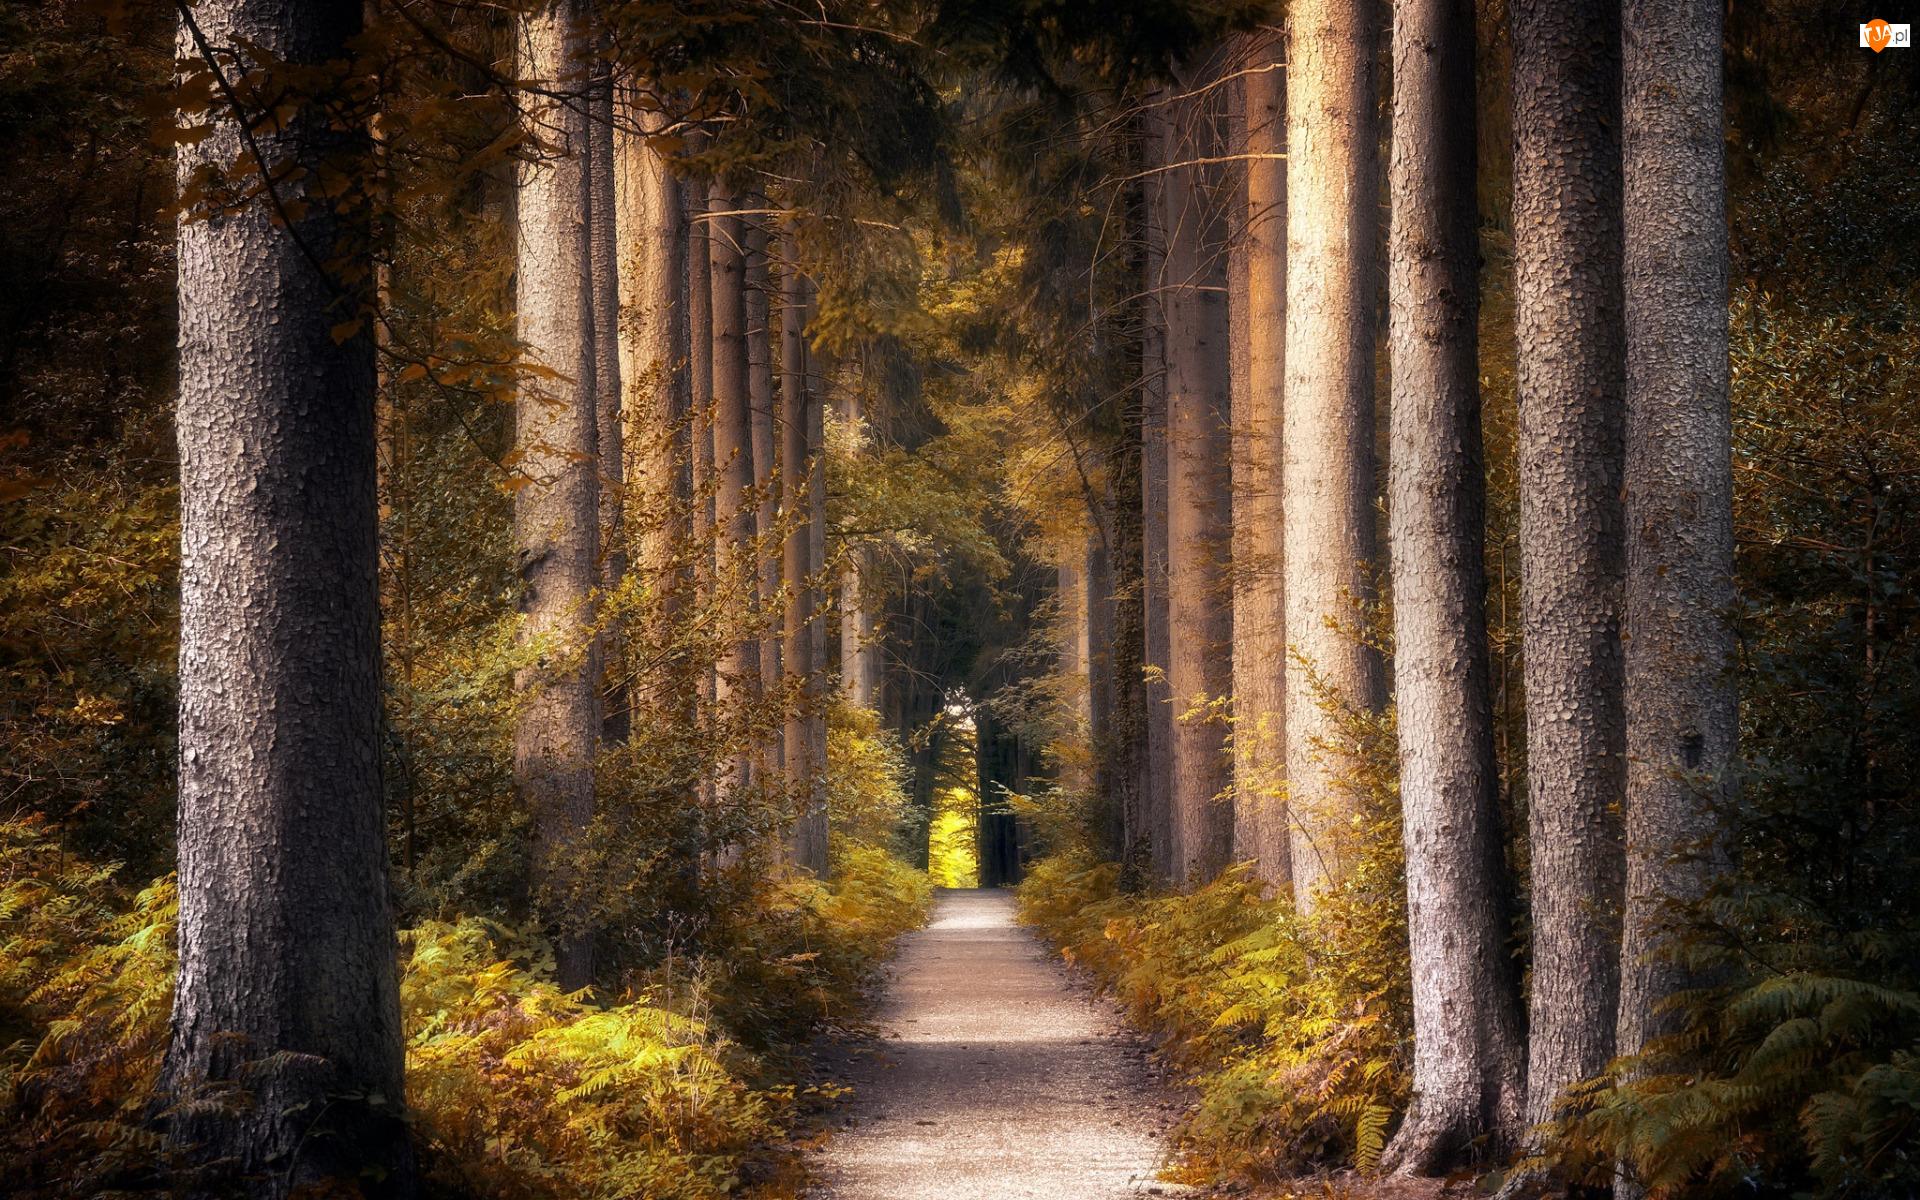 Paprocie, Las, Drzewa, Droga